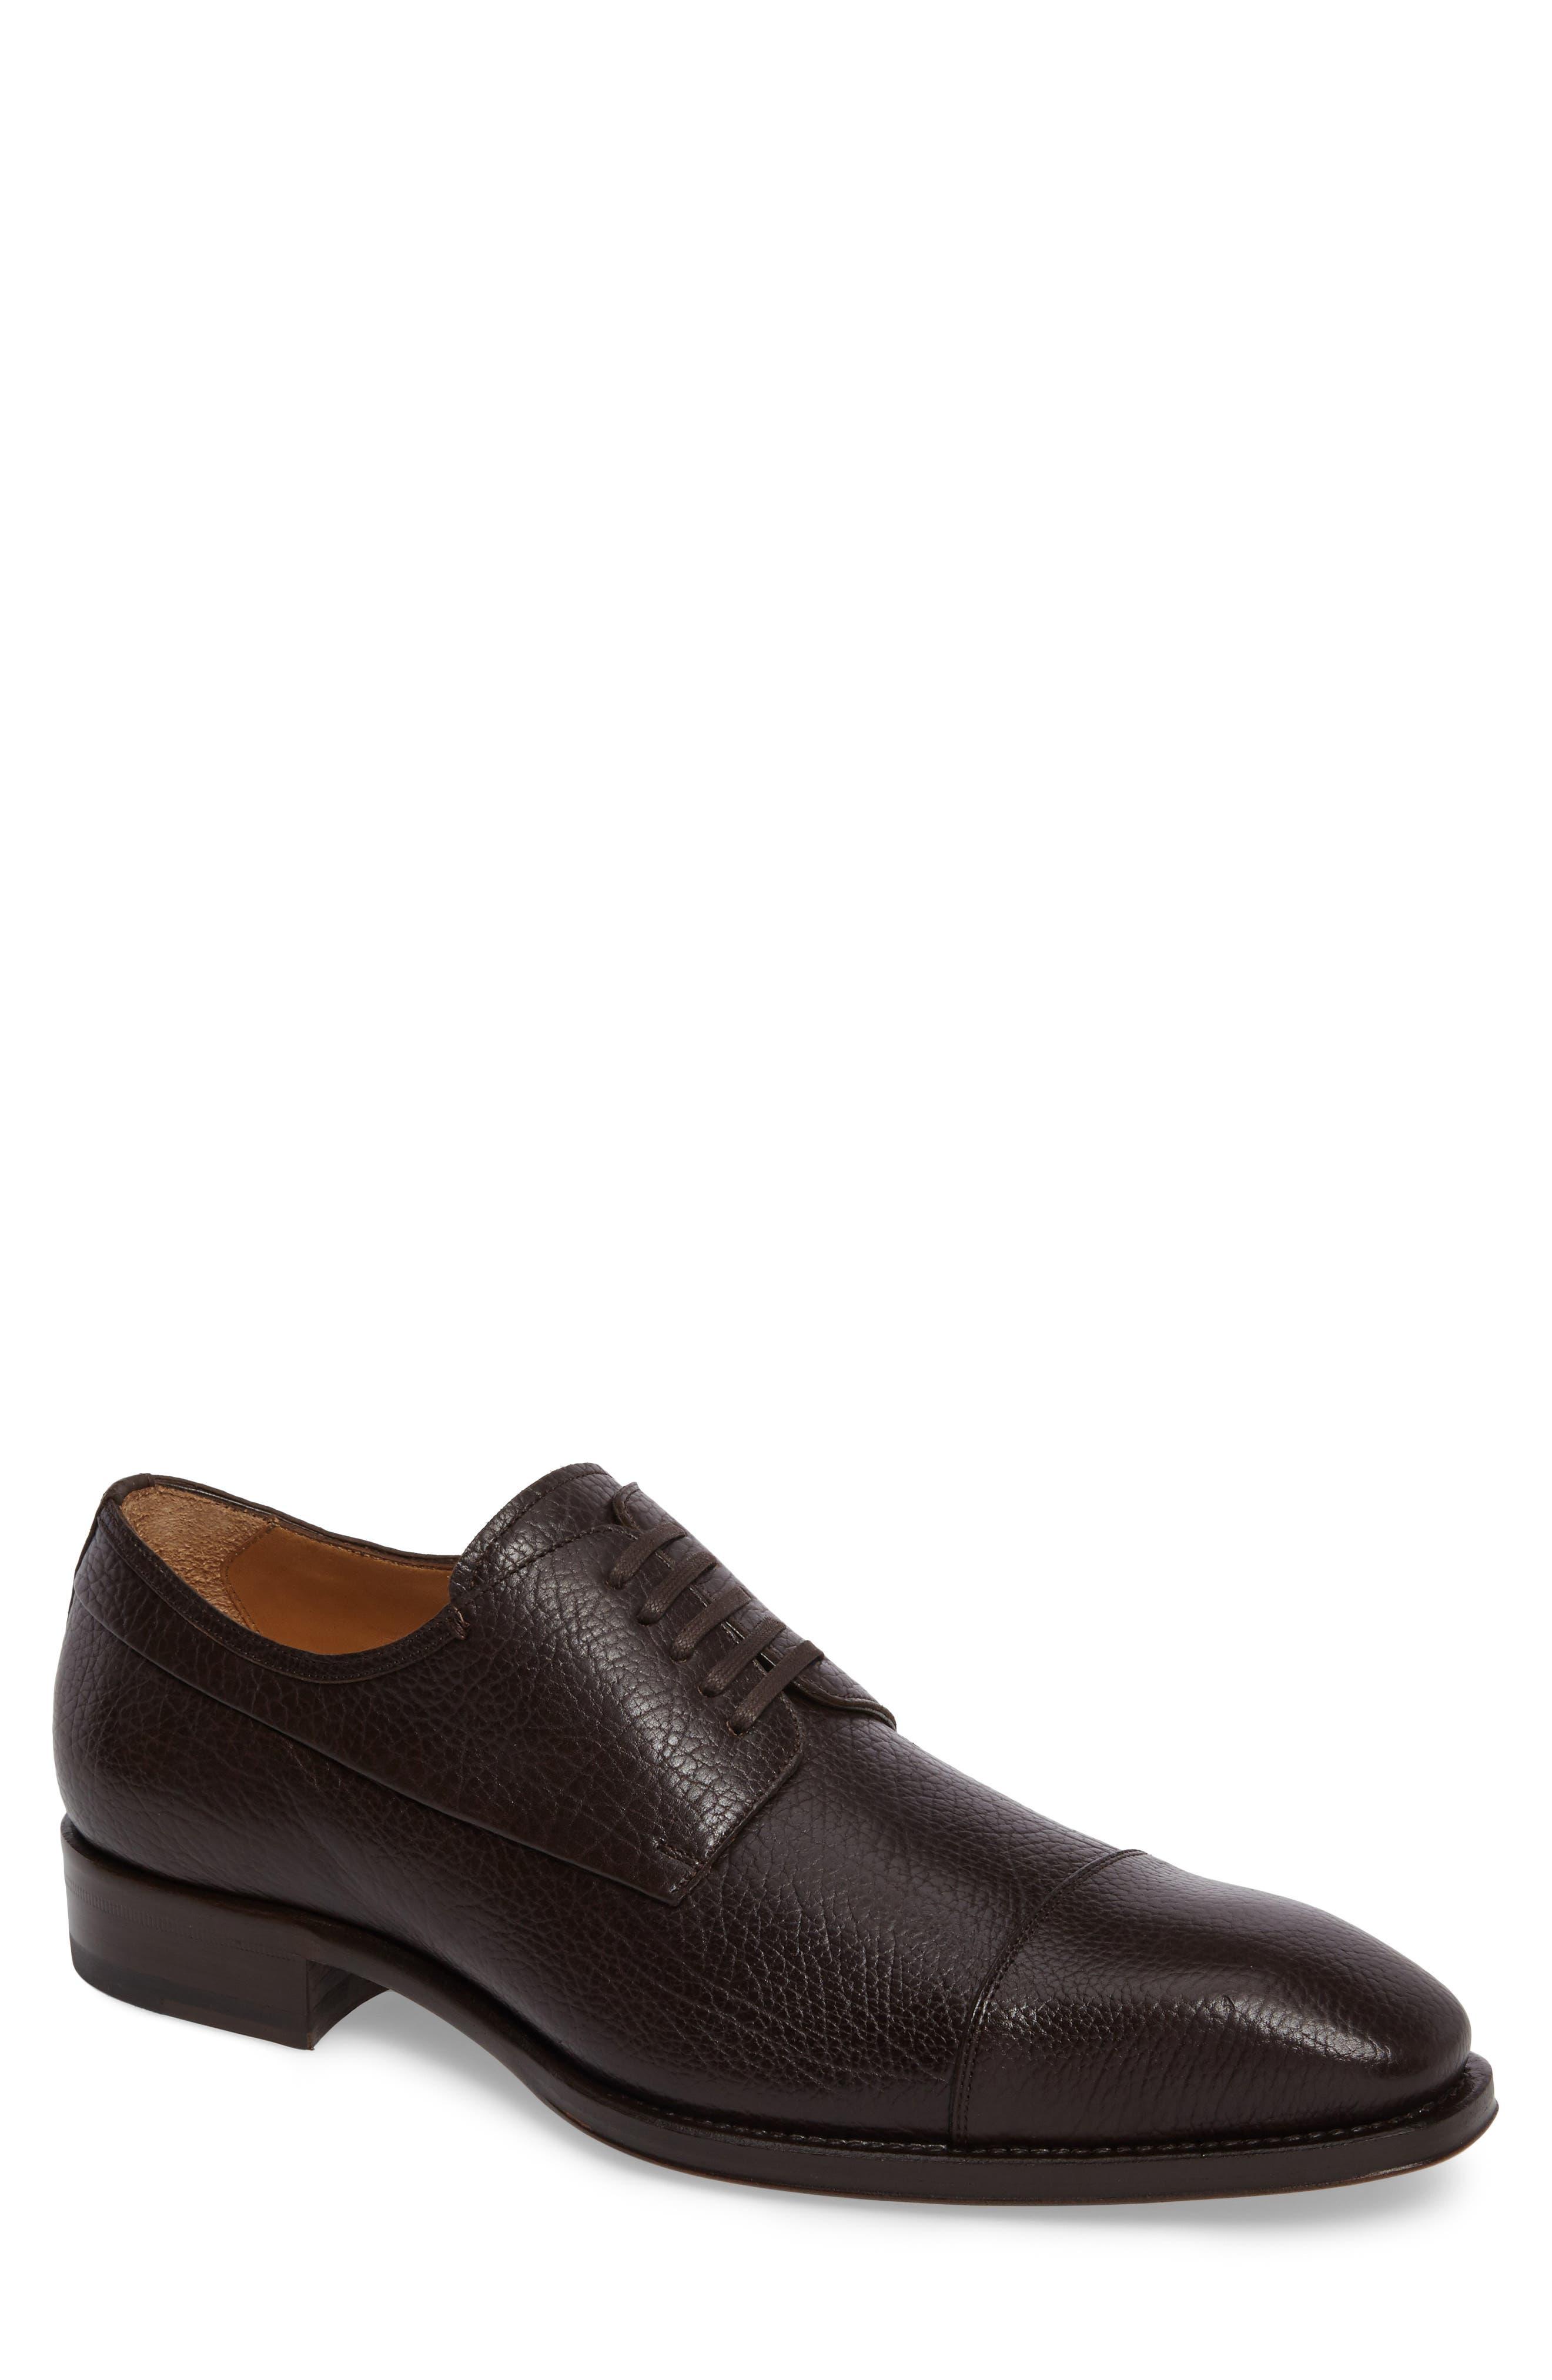 Pulpi Cap Toe Derby,                             Main thumbnail 1, color,                             Brown Leather